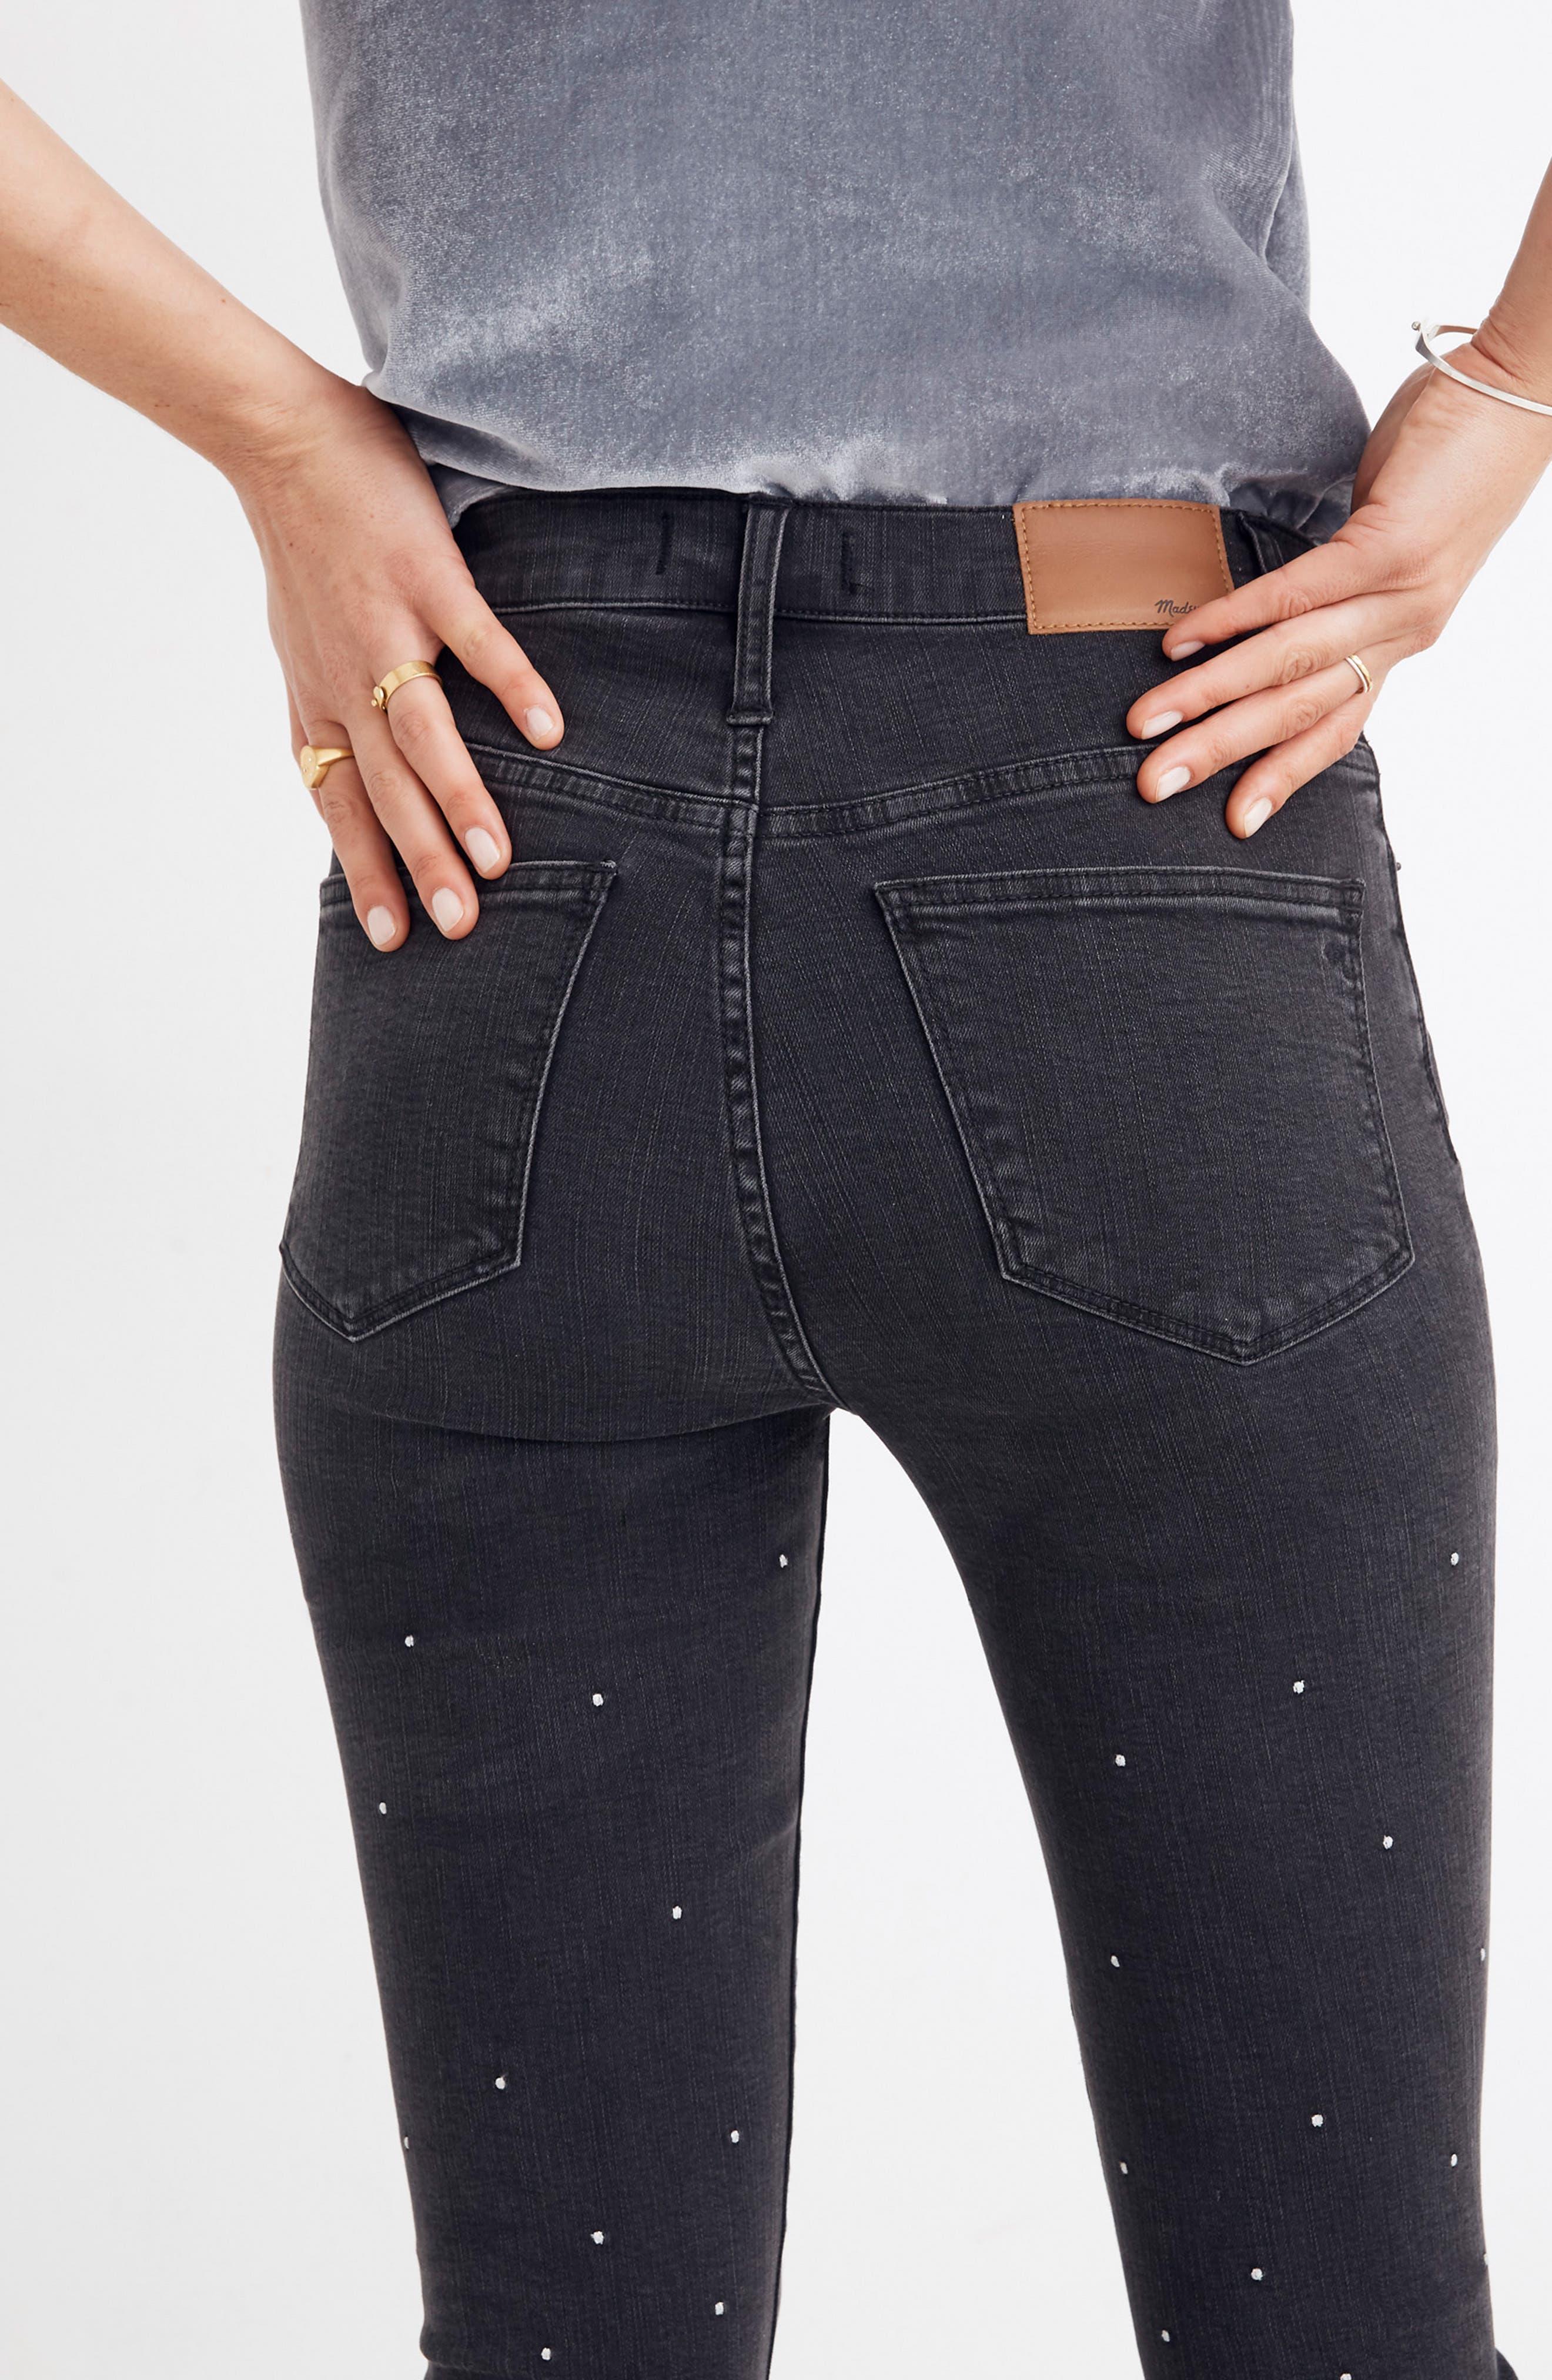 Cali Demi Boot Jeans,                             Alternate thumbnail 7, color,                             SILVER DOTS